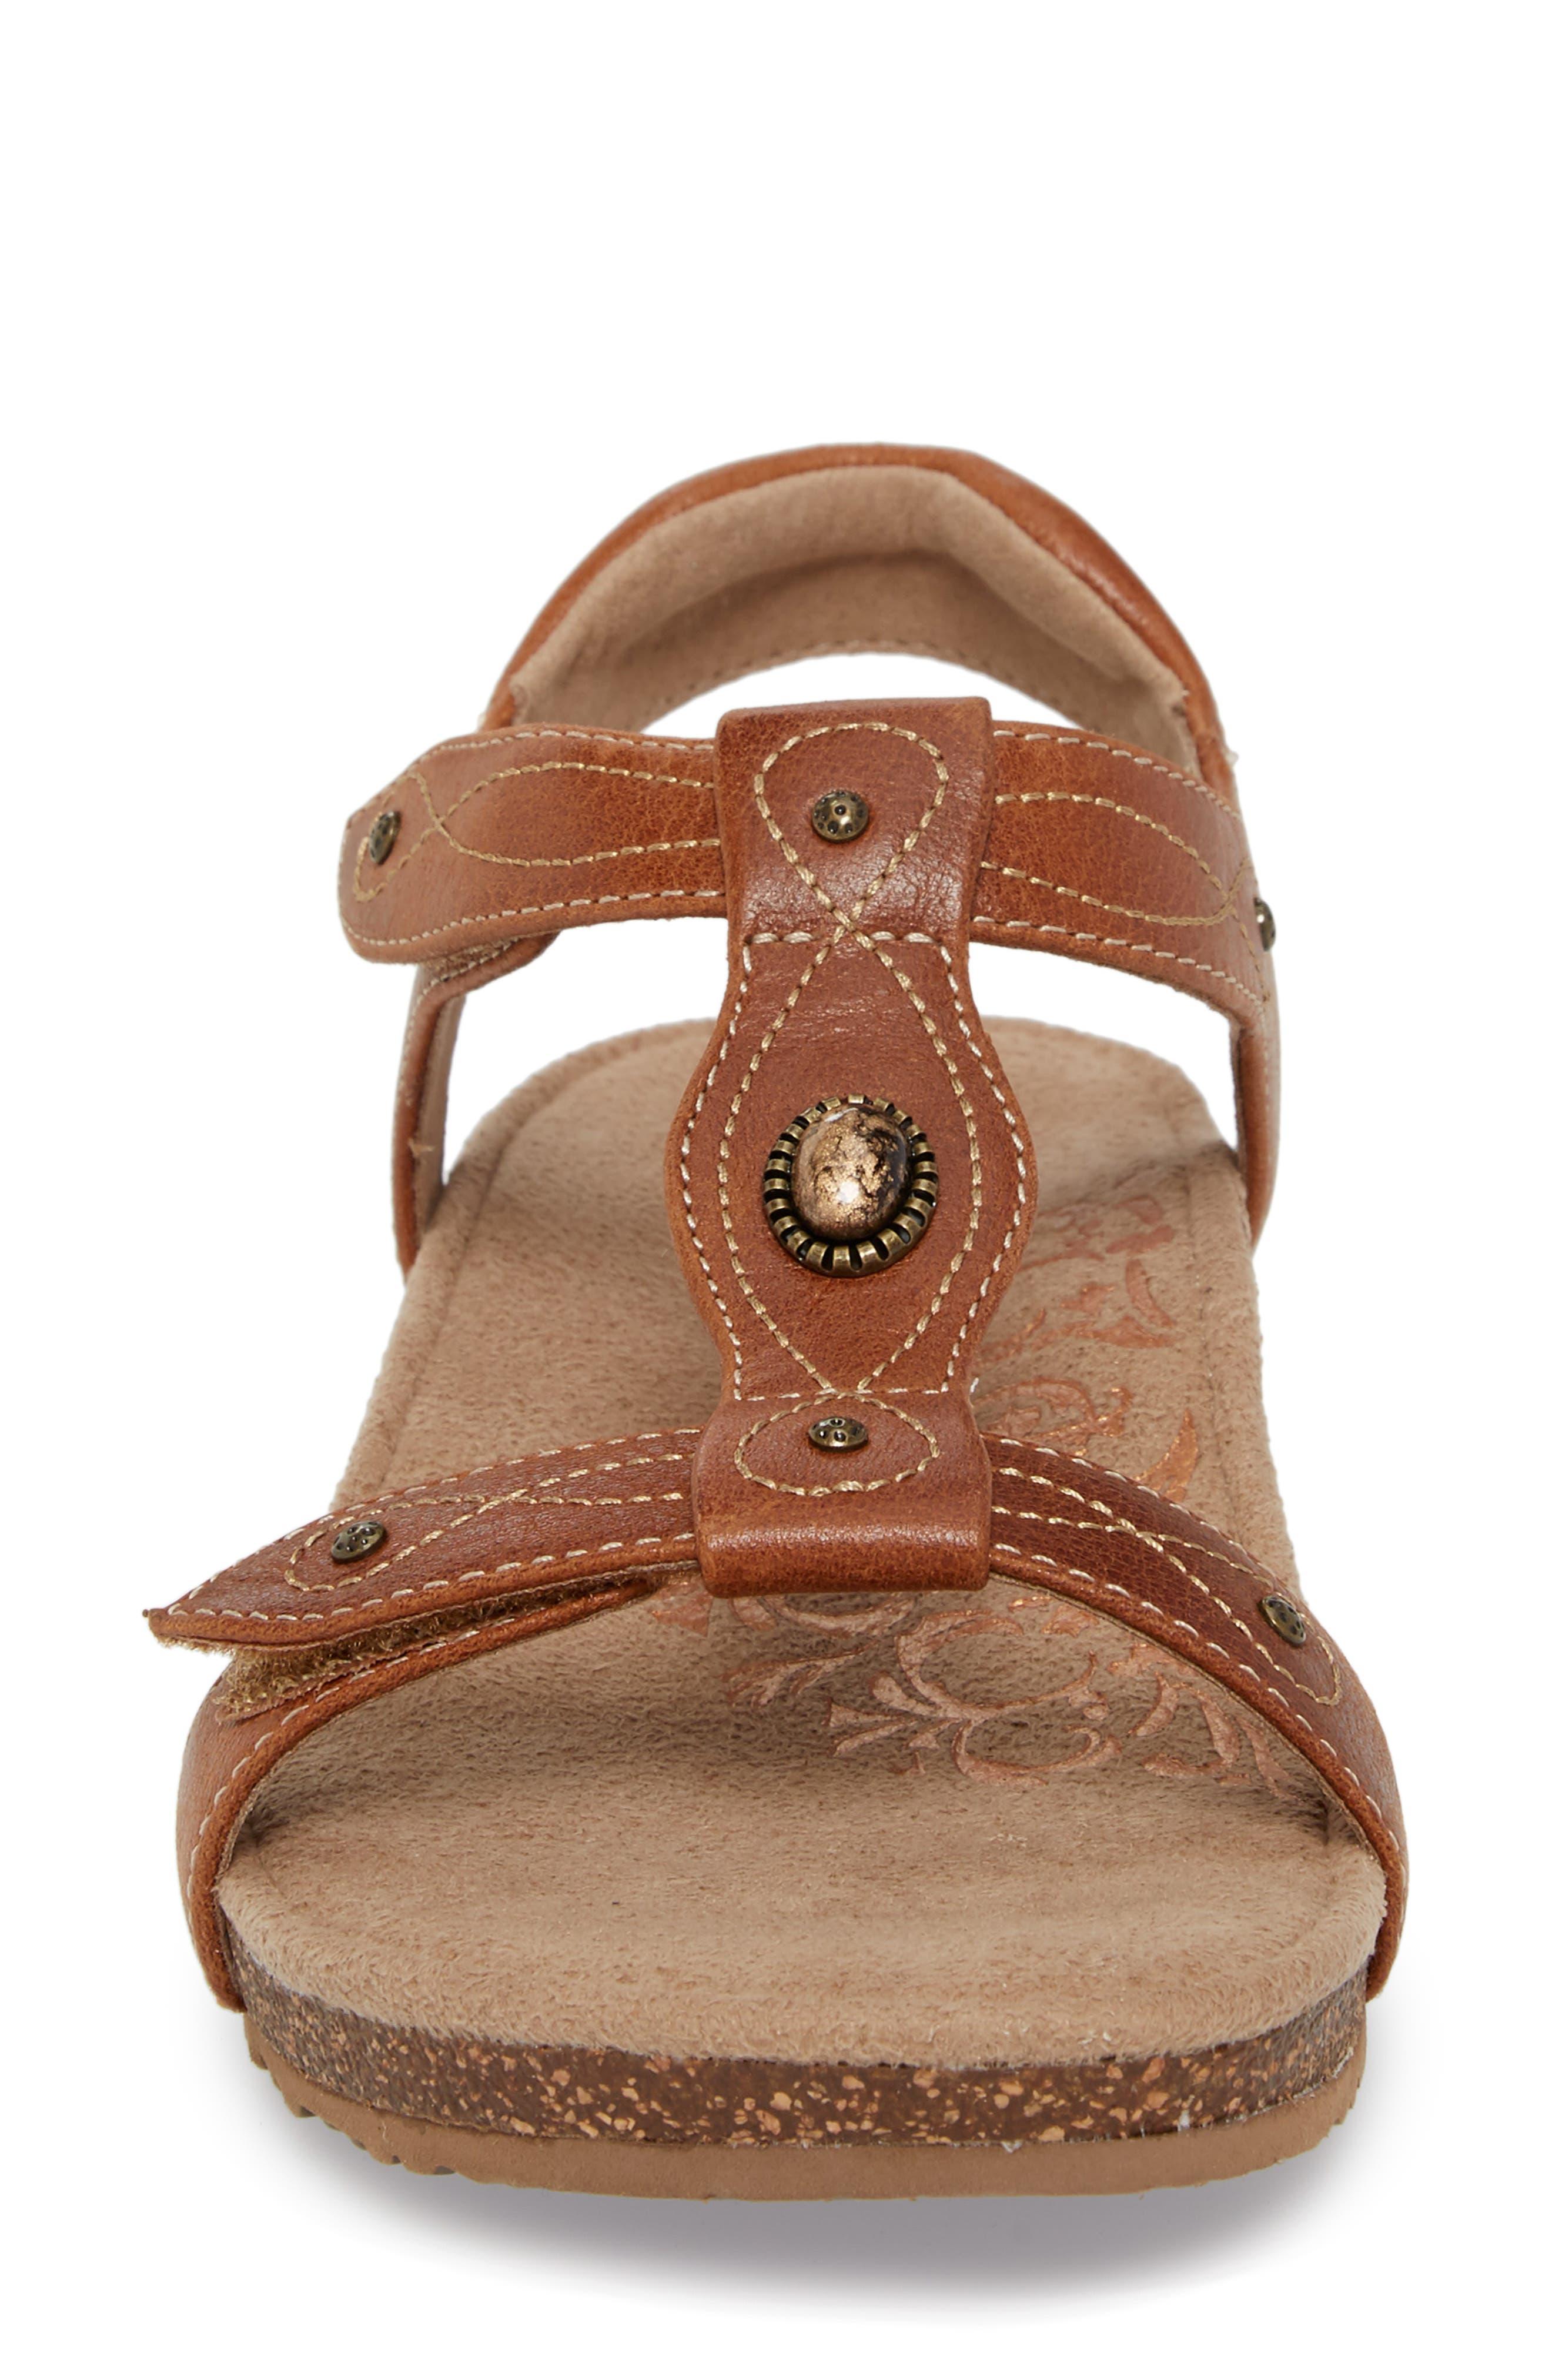 'Lori' Sandal,                             Alternate thumbnail 4, color,                             Cognac Leather